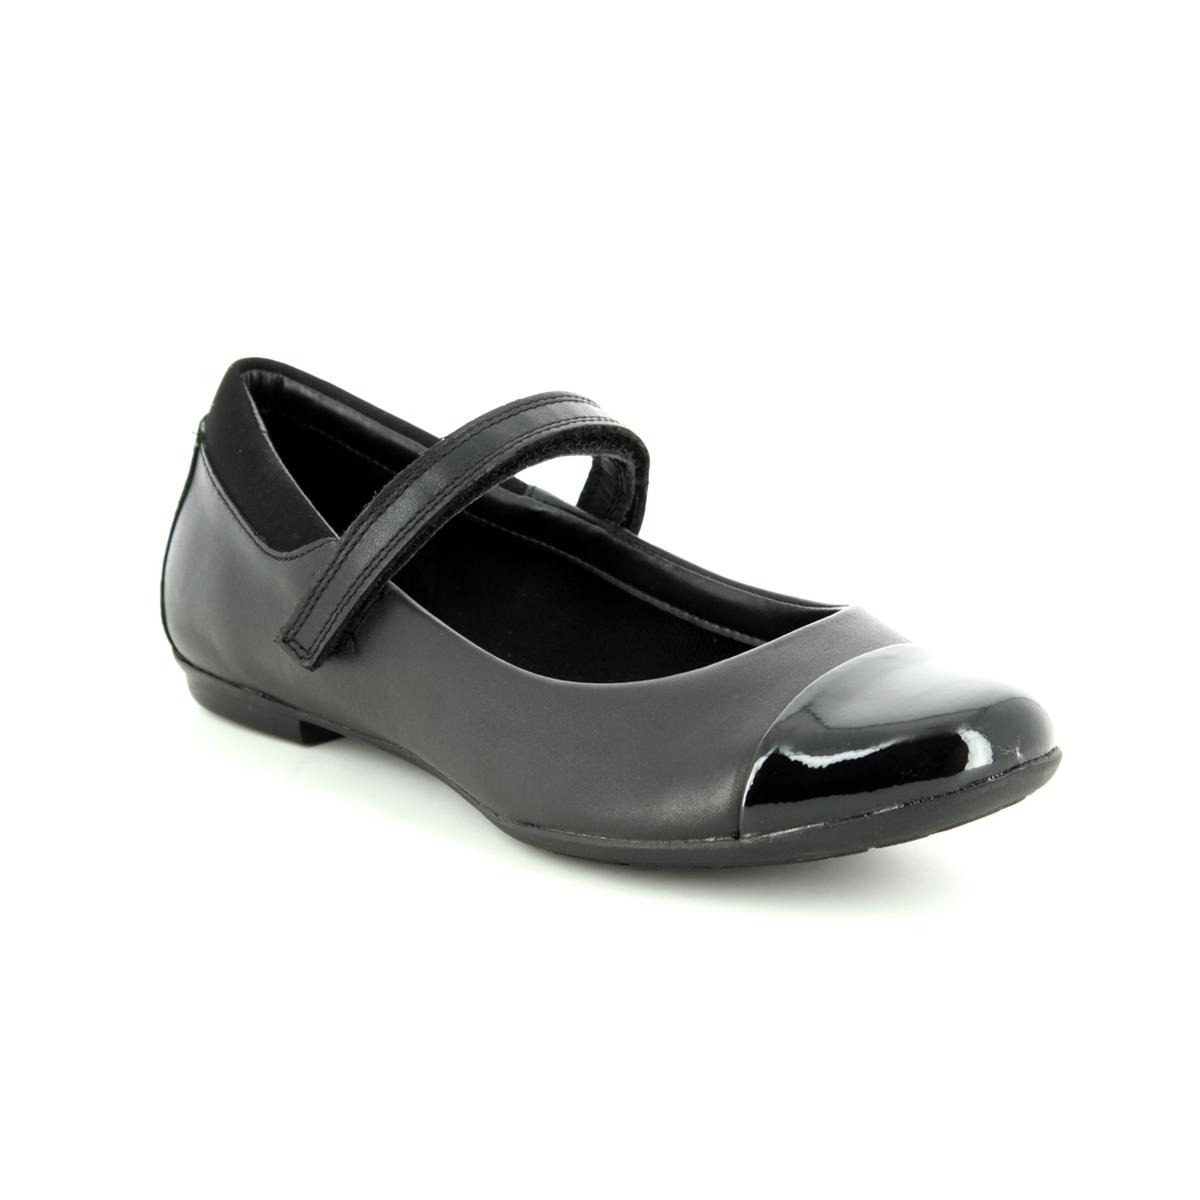 tizz talk school shoes Shop Clothing